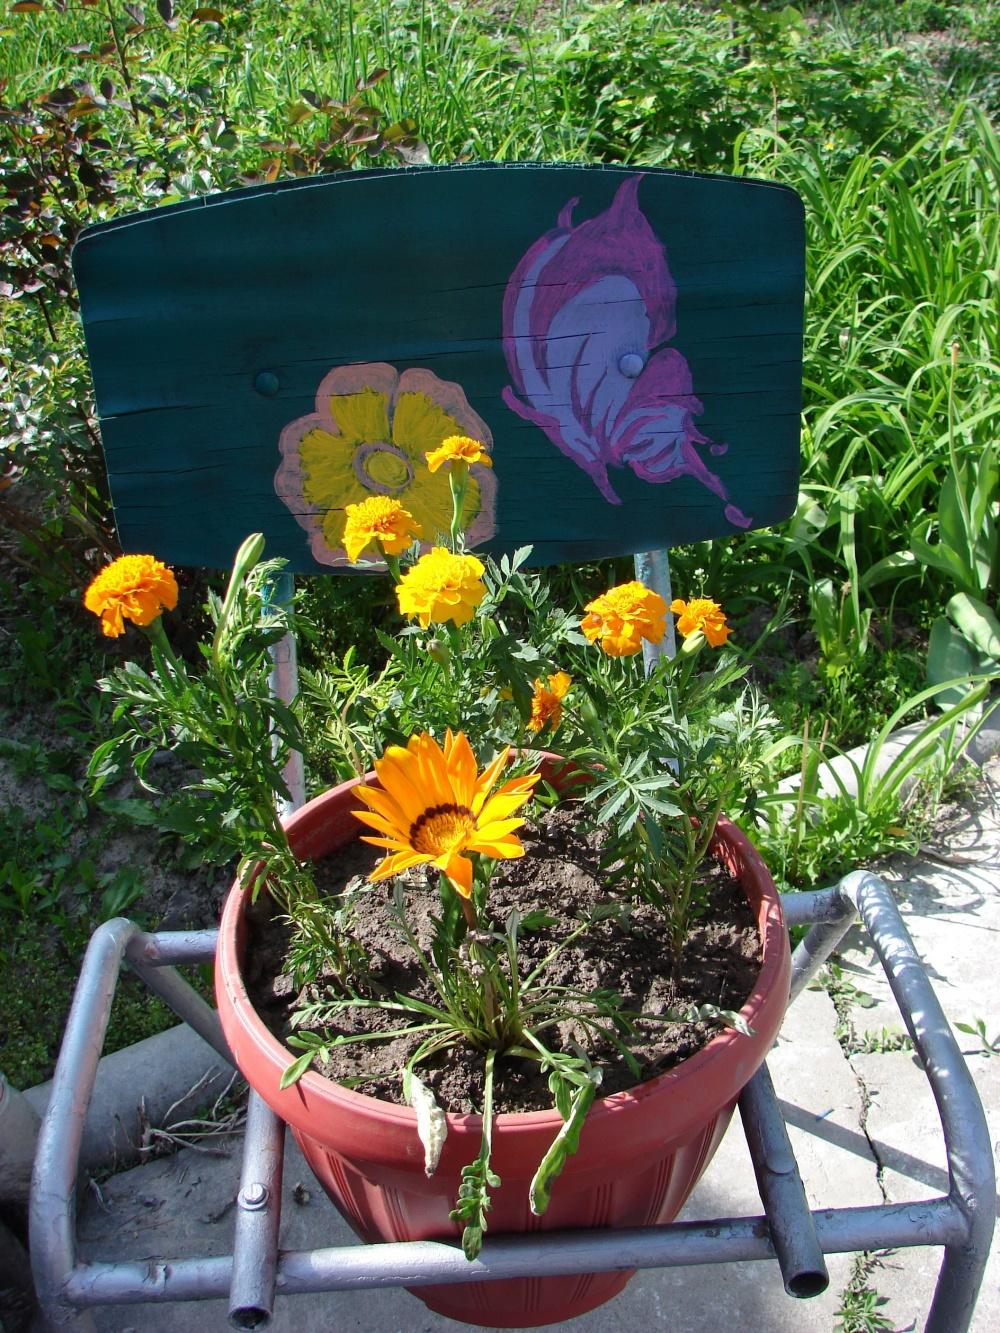 Горшок с цветами установлен на стул